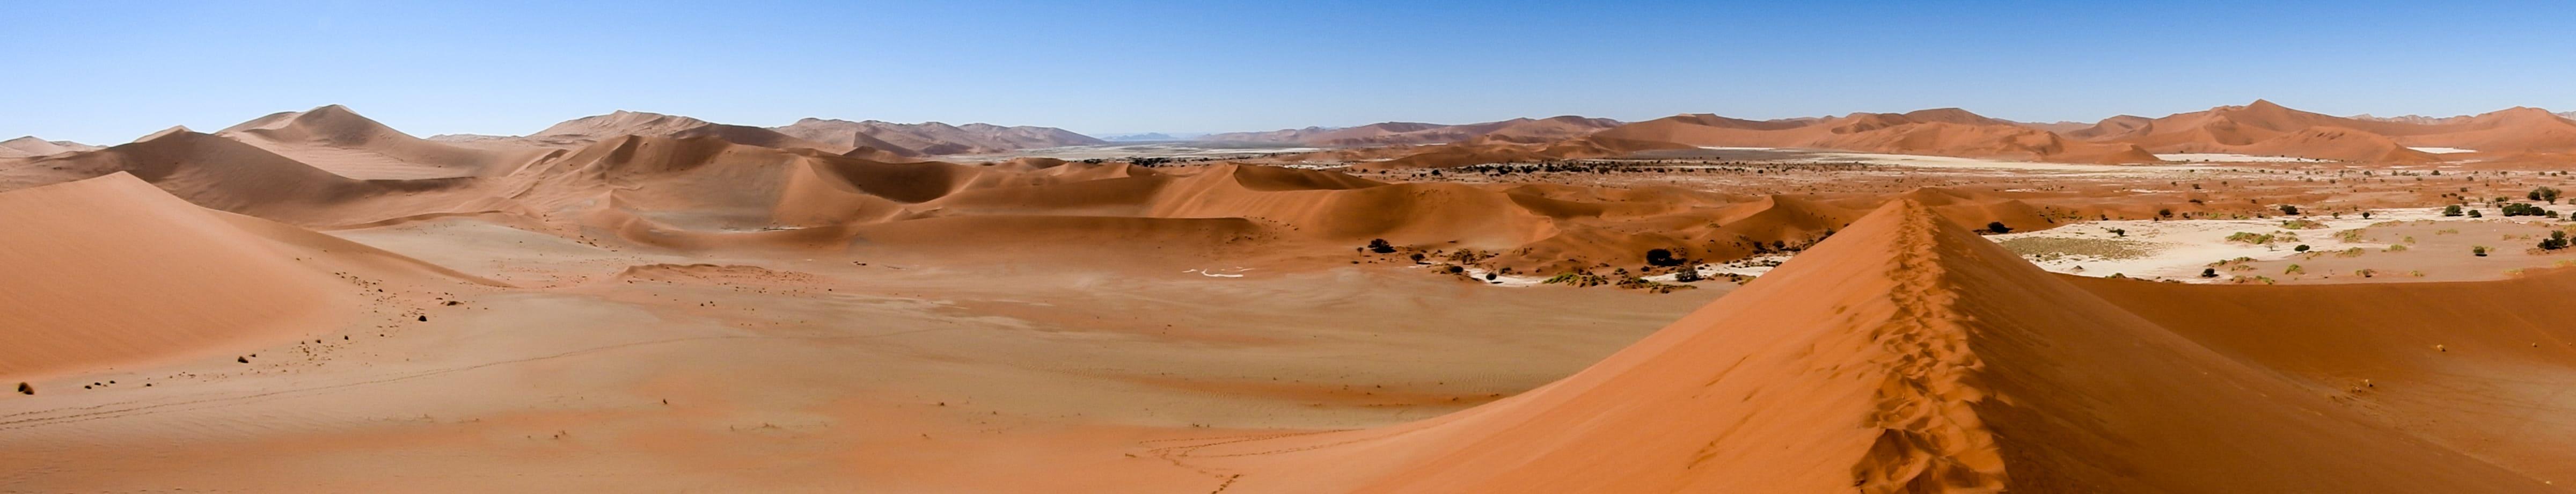 Namibia-Sossusvlei-02